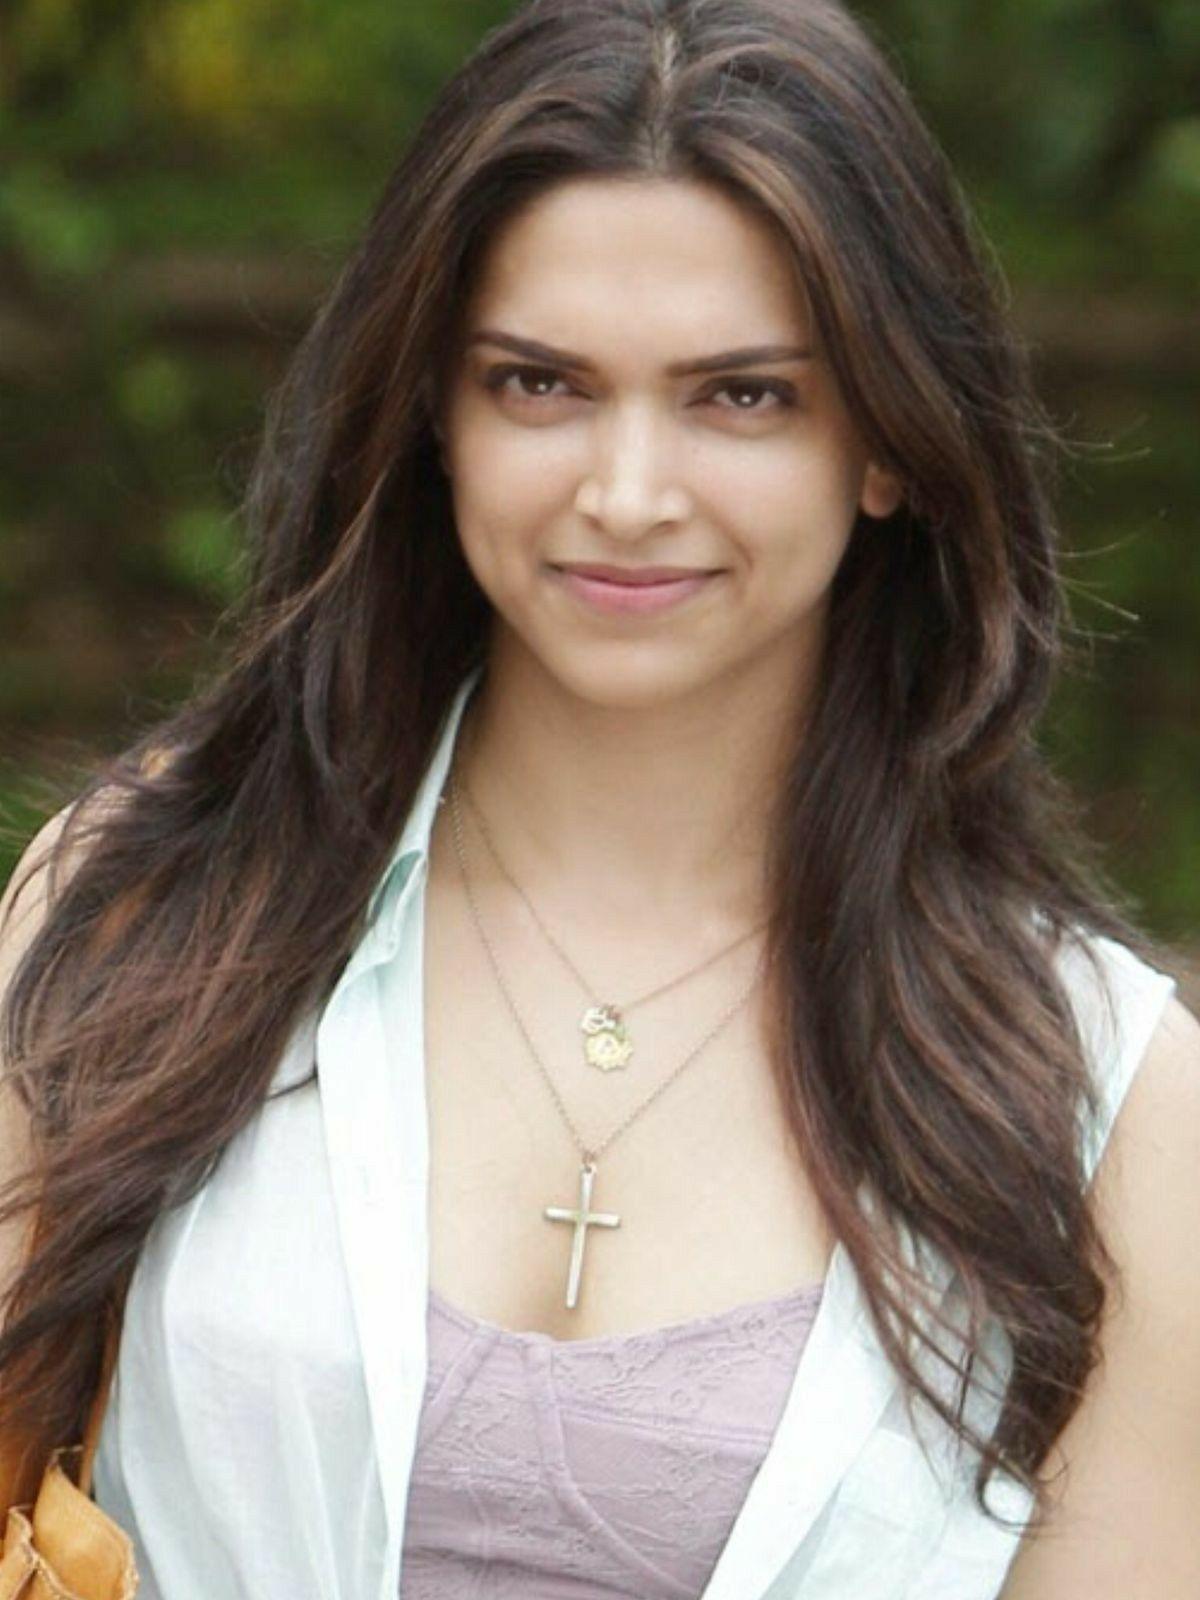 Is a cute Deepika Padukone nude photos 2019